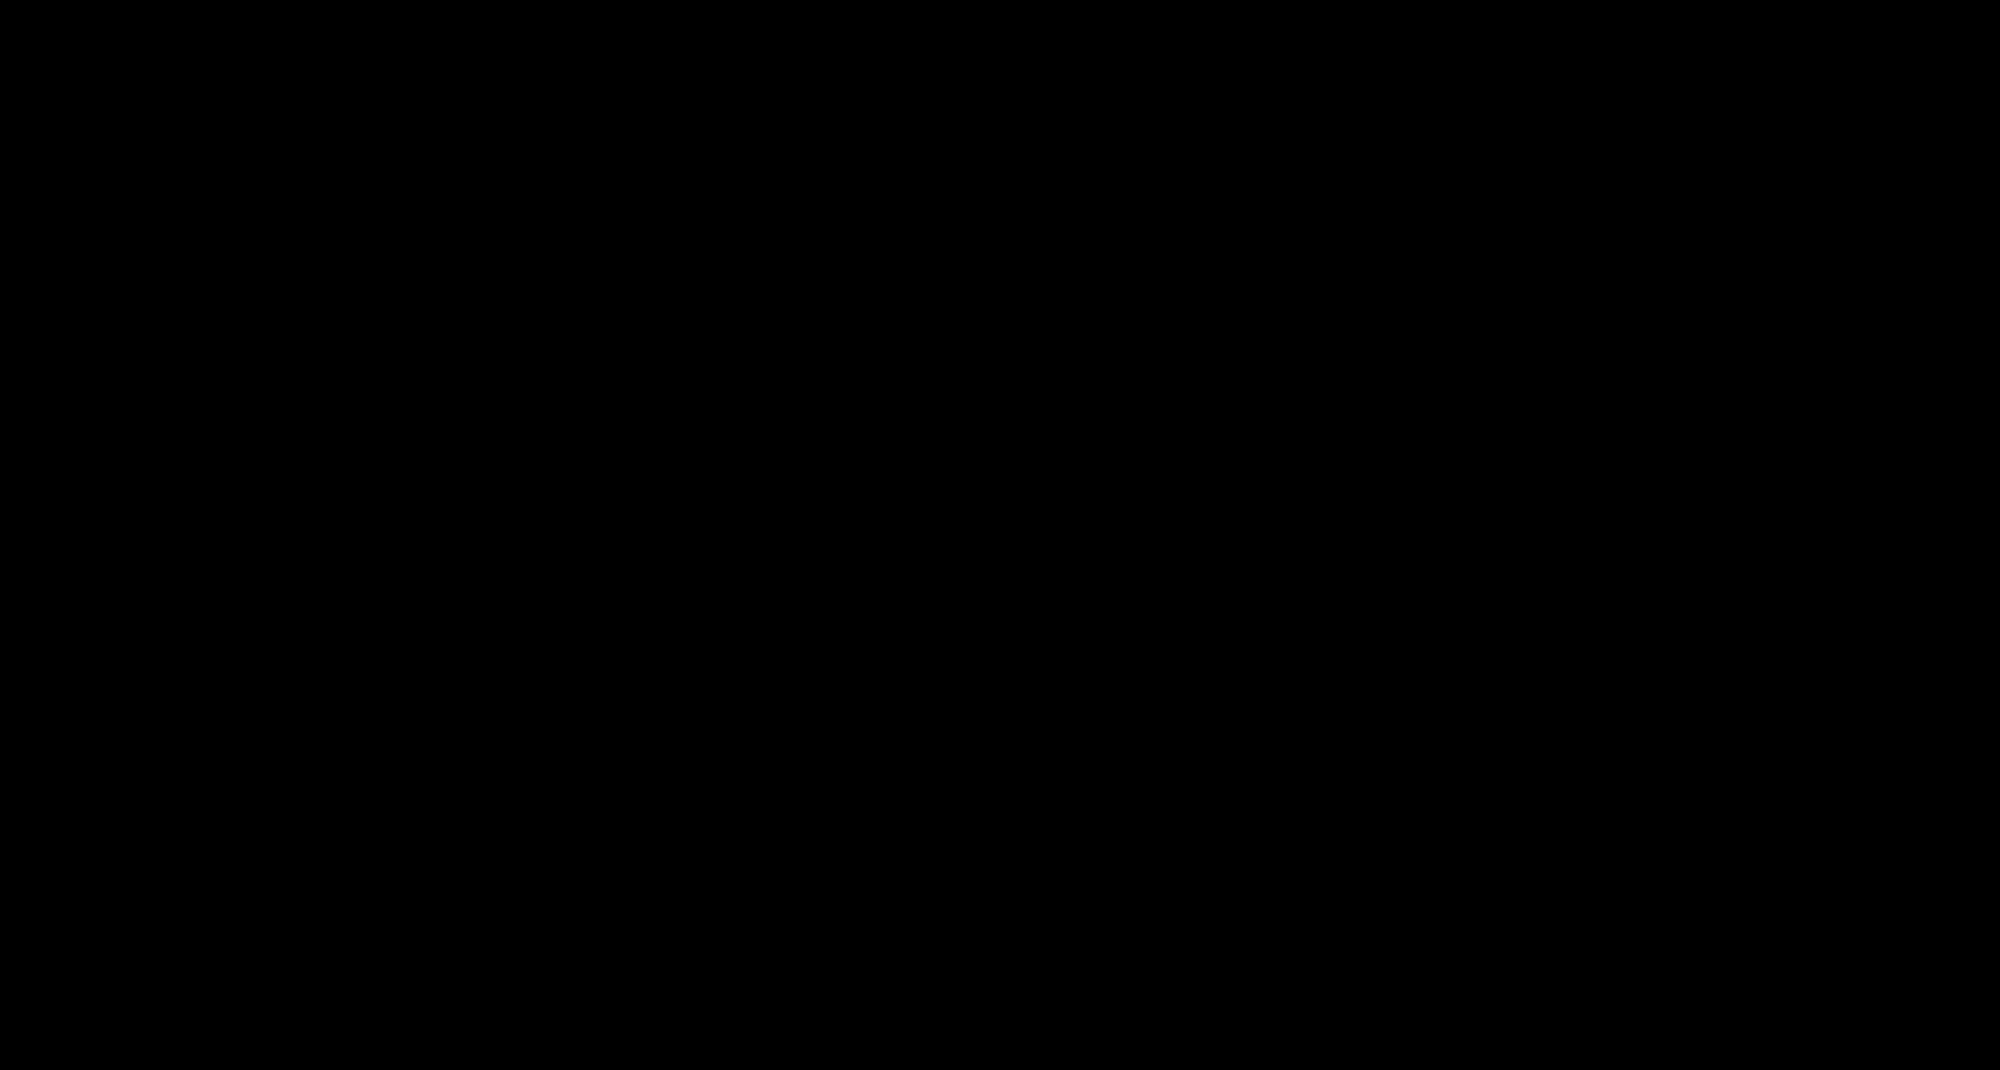 PNG Star Wars - 59890